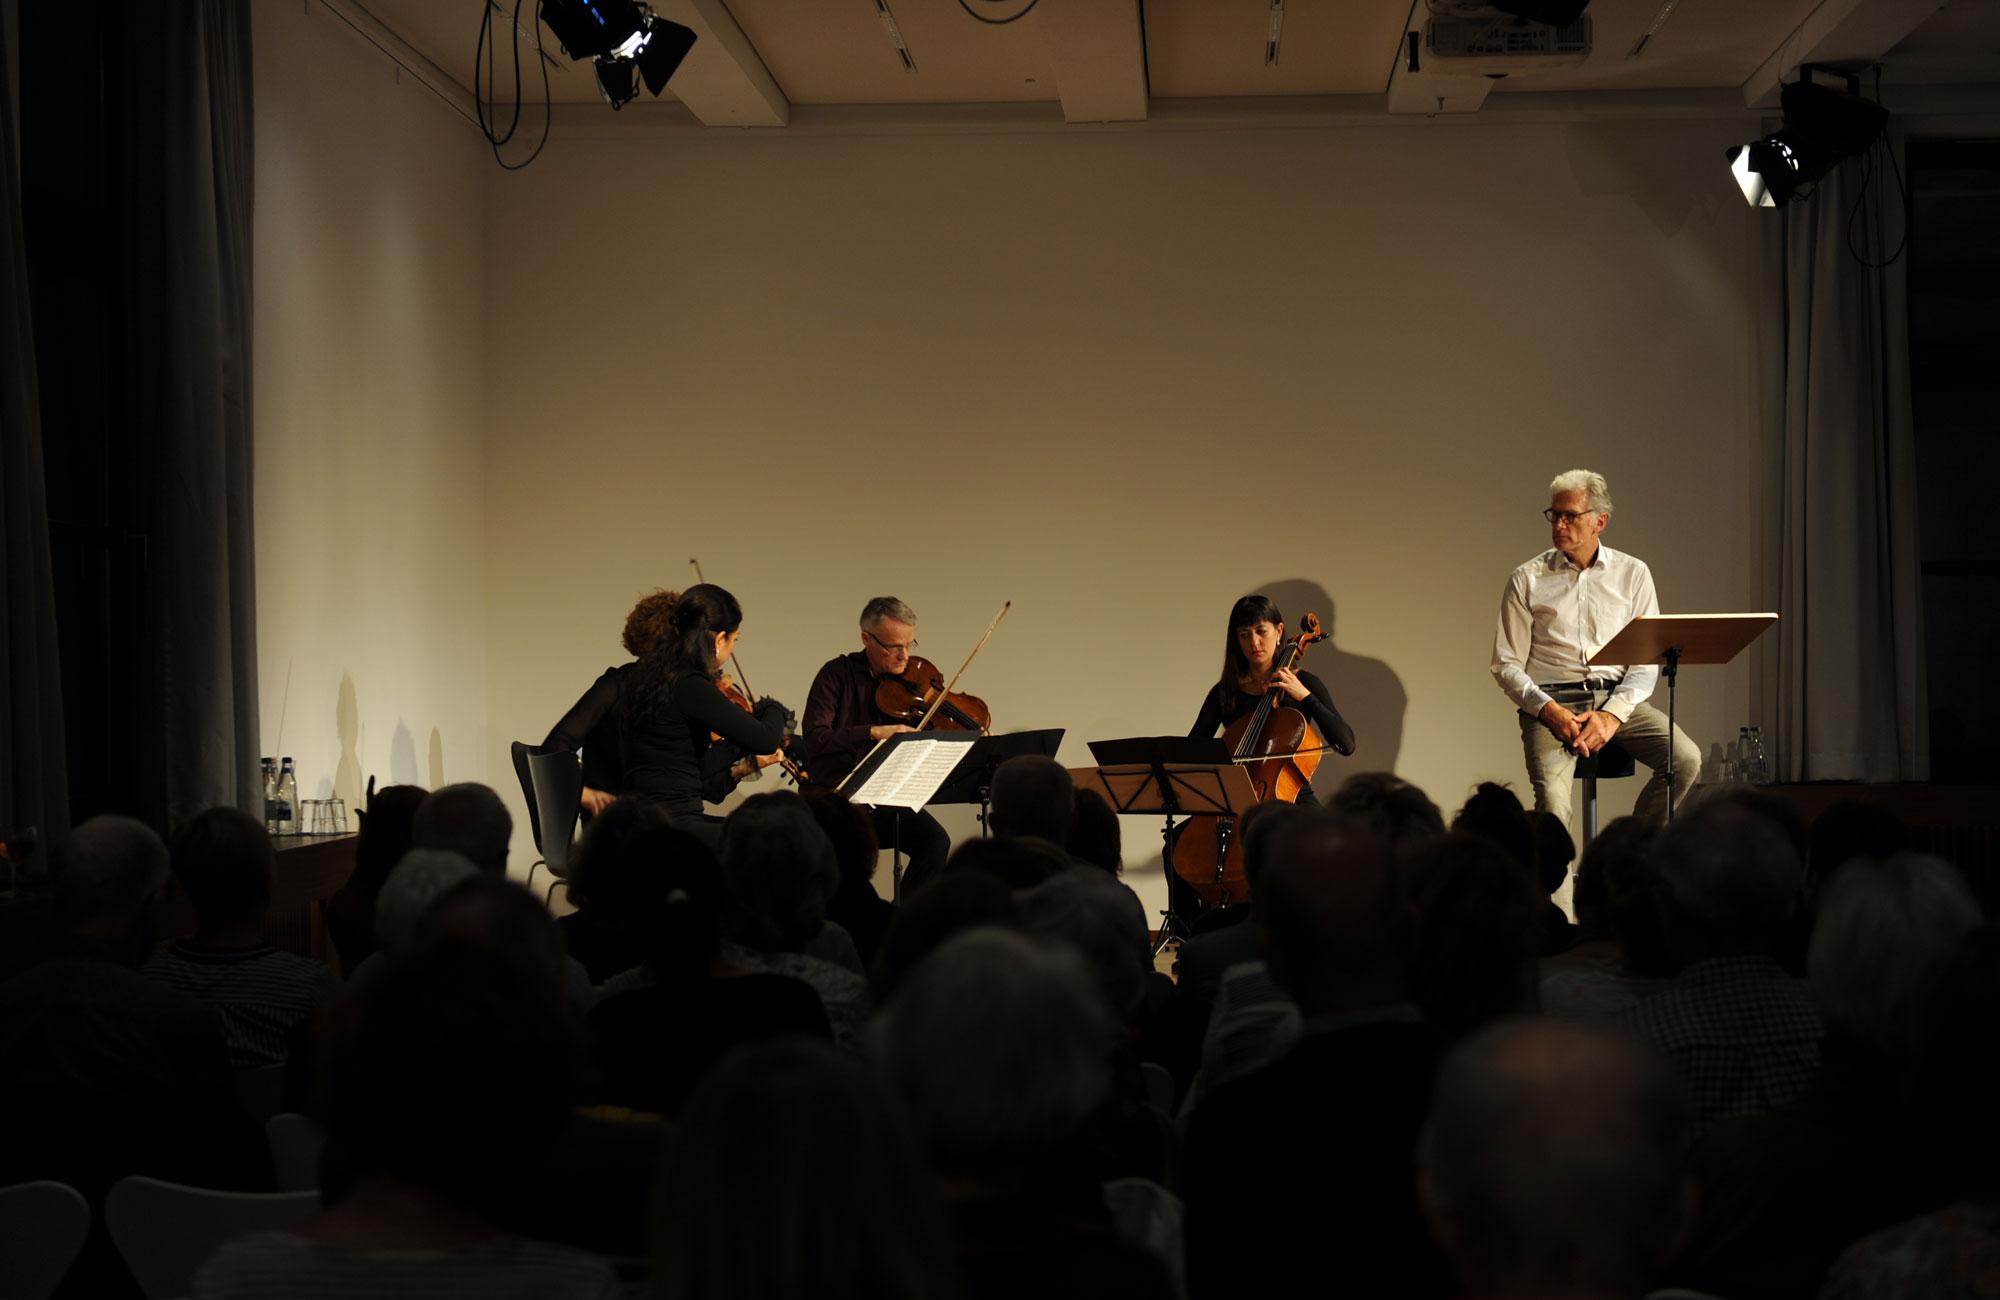 Walter Sittler, Hegel Quartet: Intime Briefe x 2 <br/>(c) Kristina Popov